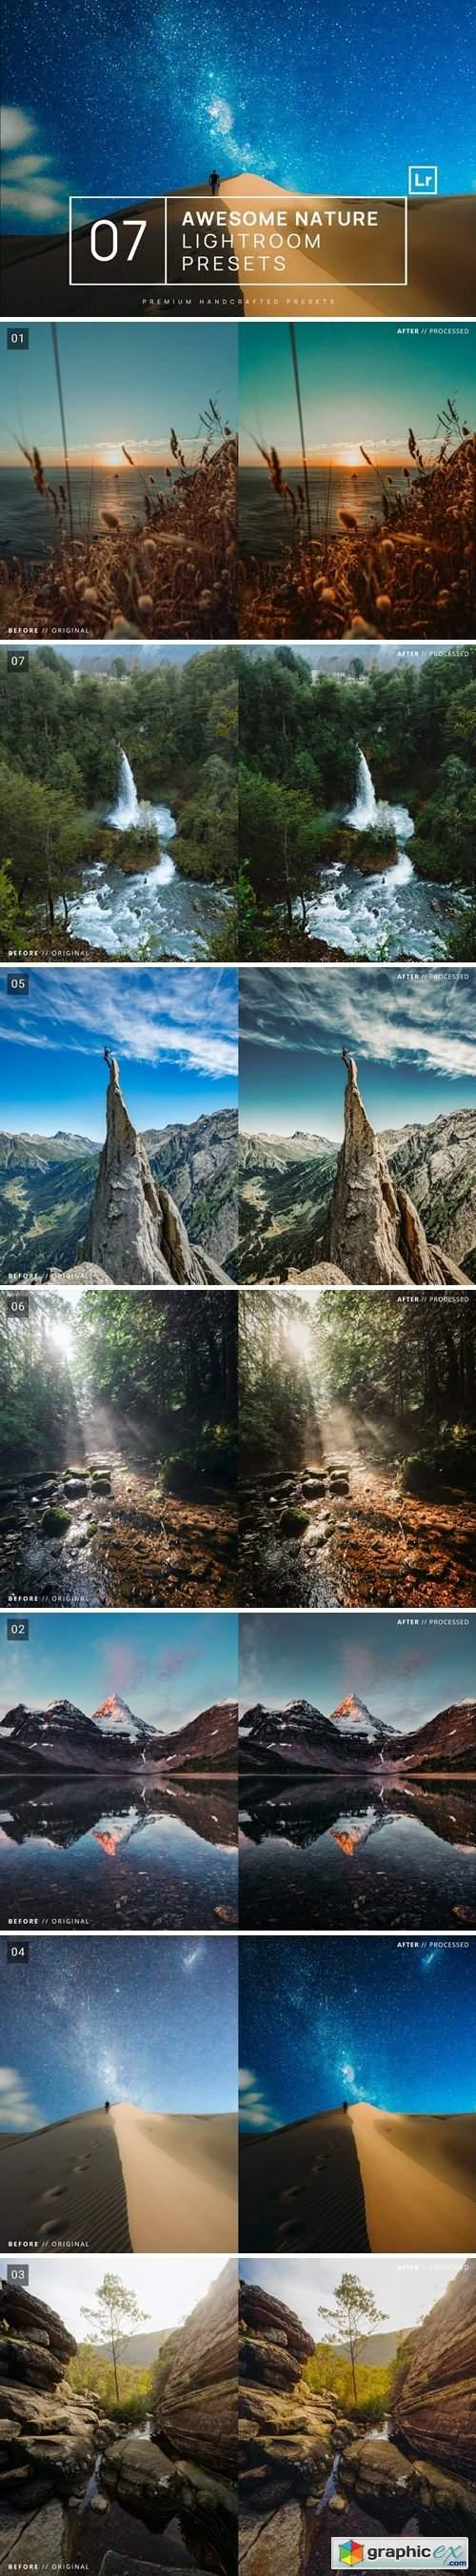 7 Awesome Nature Lightroom Presets + Mobile